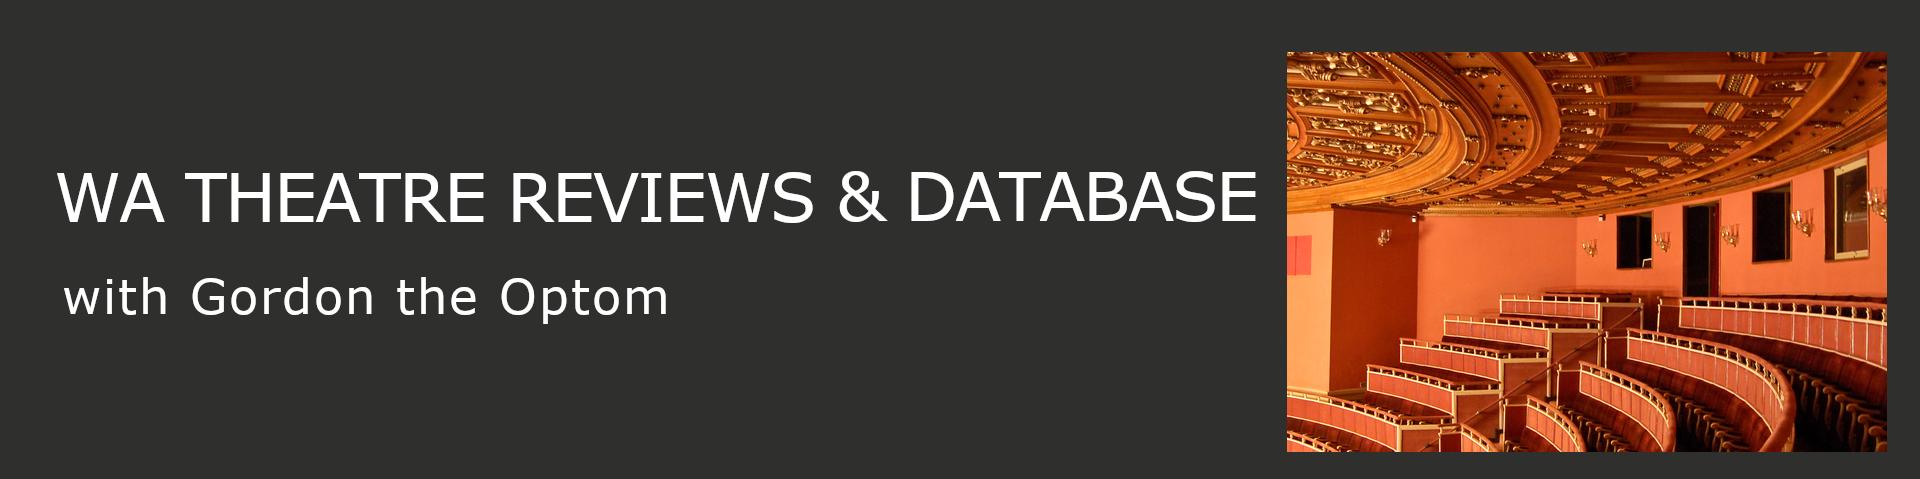 WA Theatre Reviews & Database